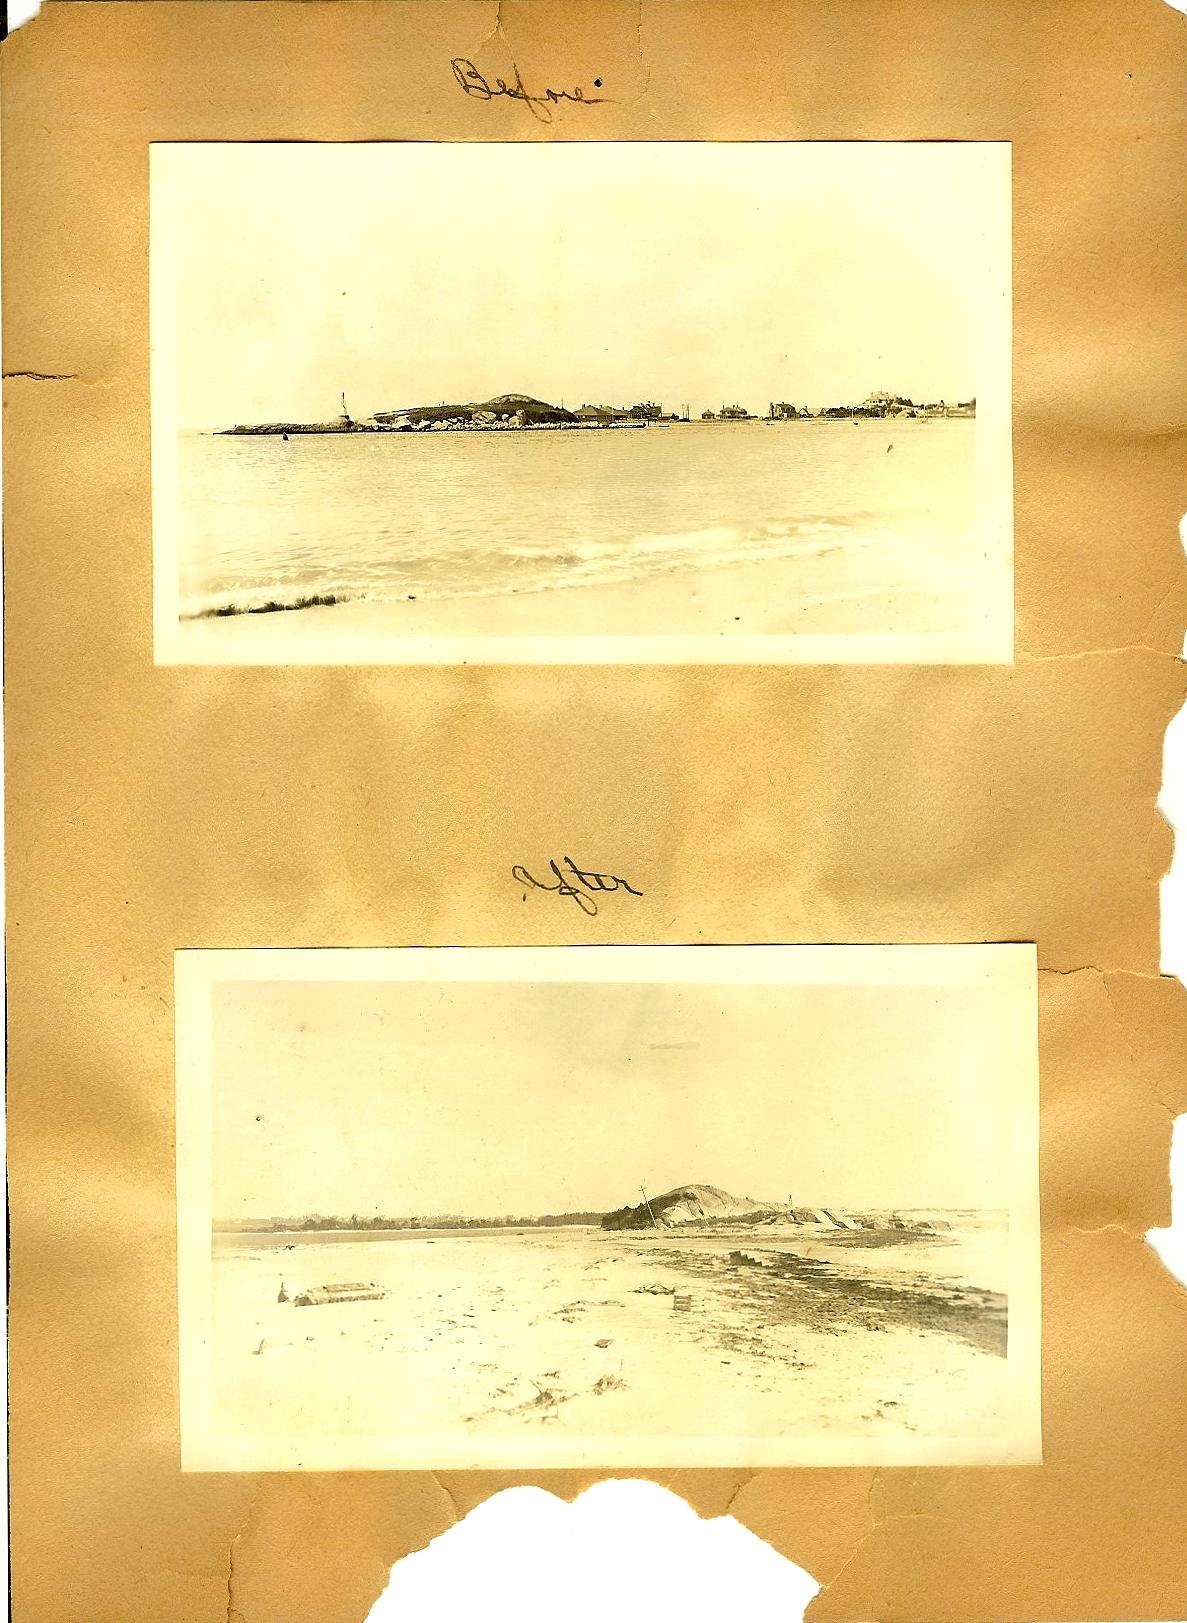 The 1938 Hurricane photos p19